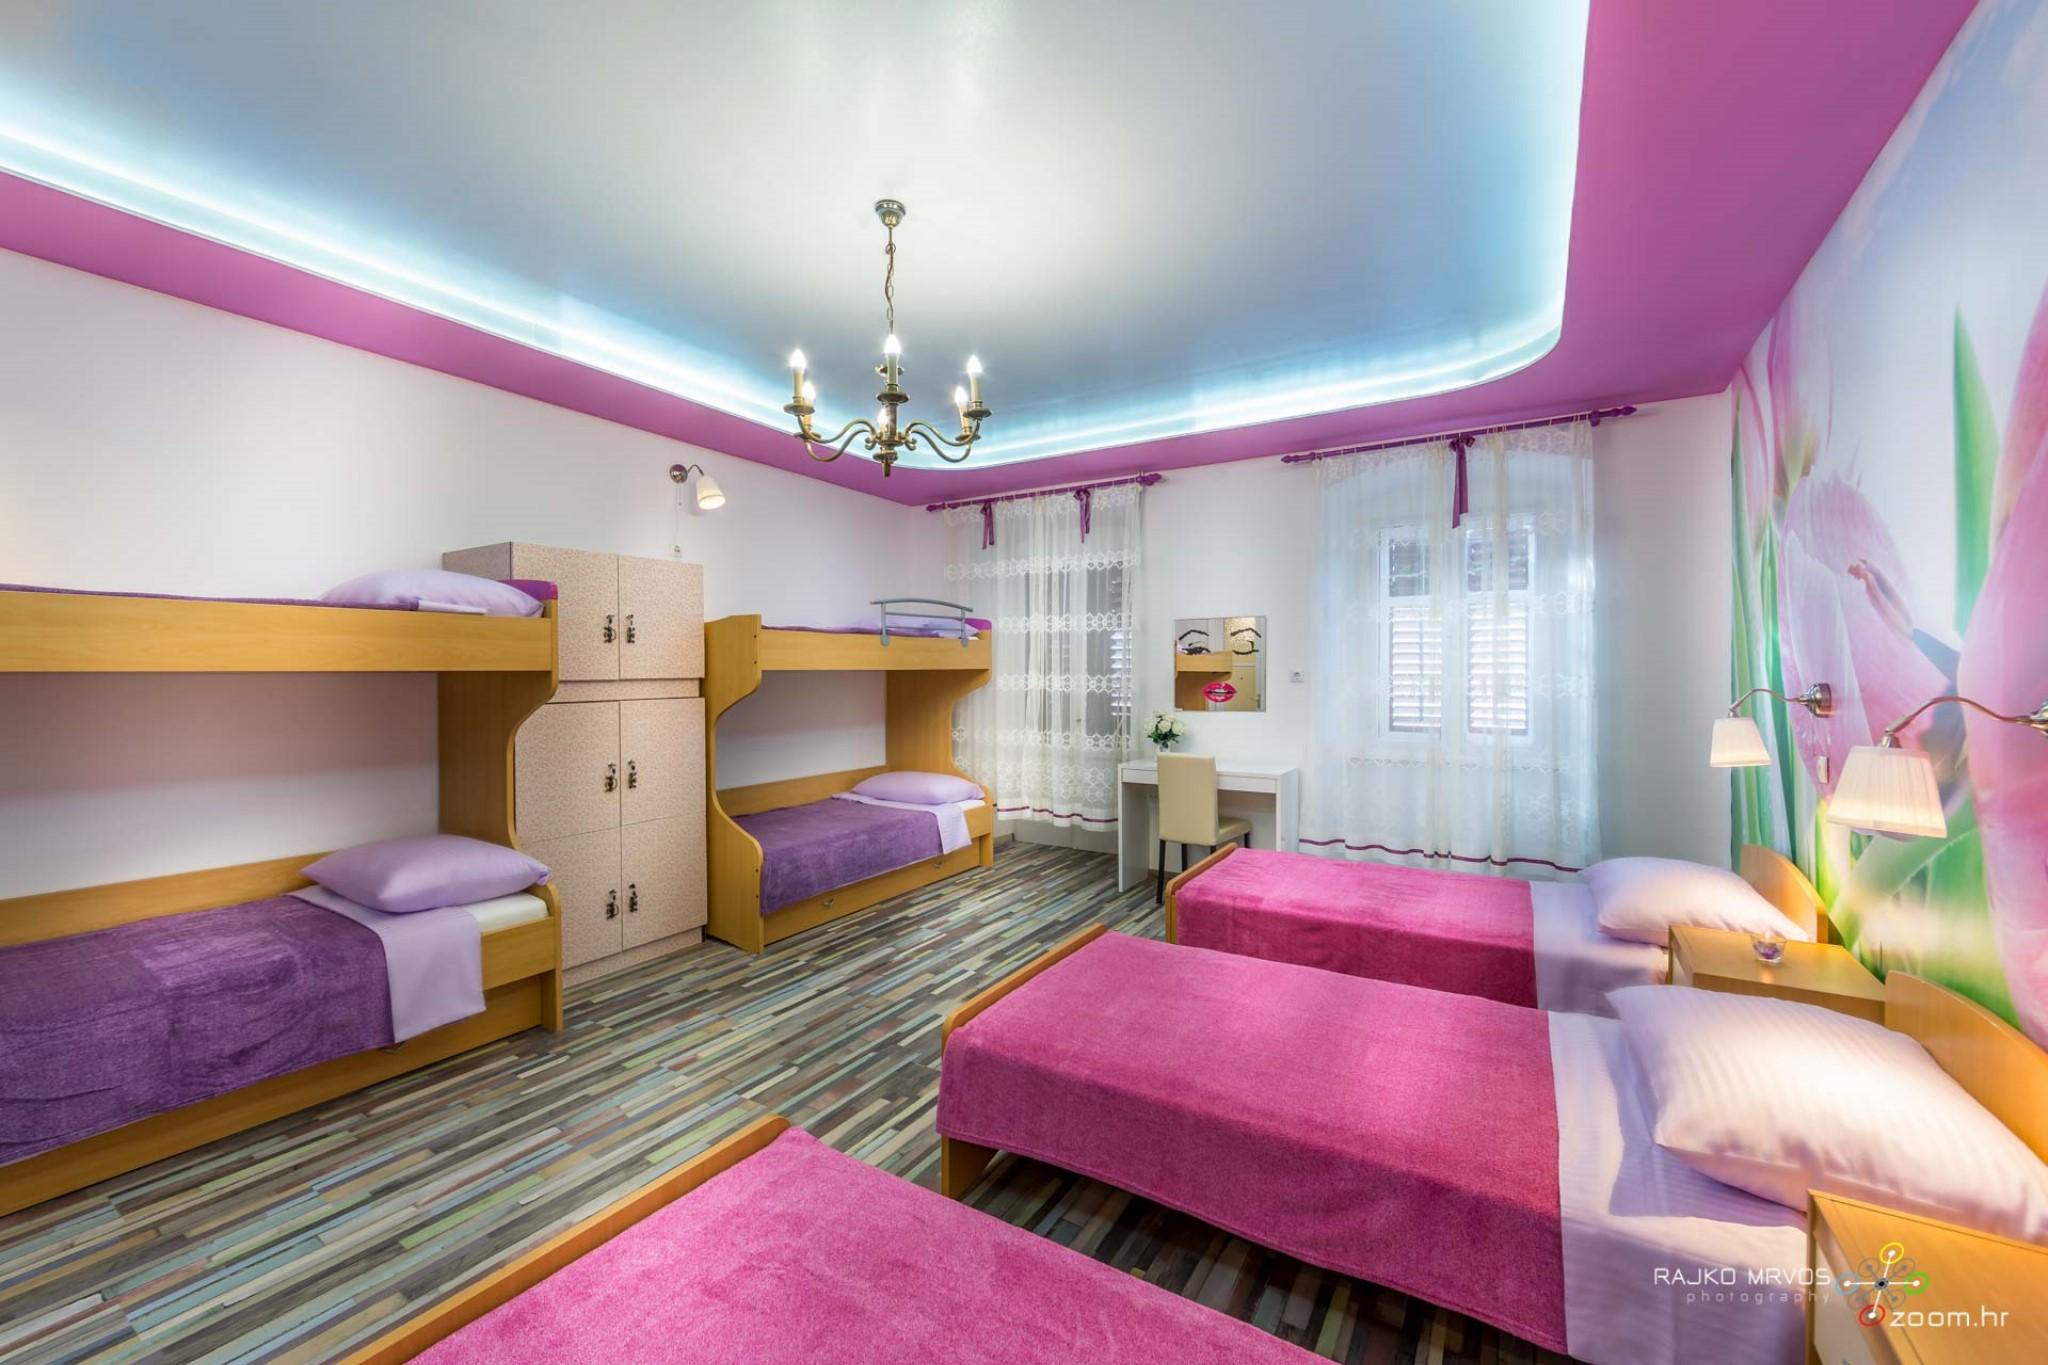 fotografiranje-interijera-fotograf-eksterijera-apartmana-vila-kuca-hostela-Happy-Hostel-5